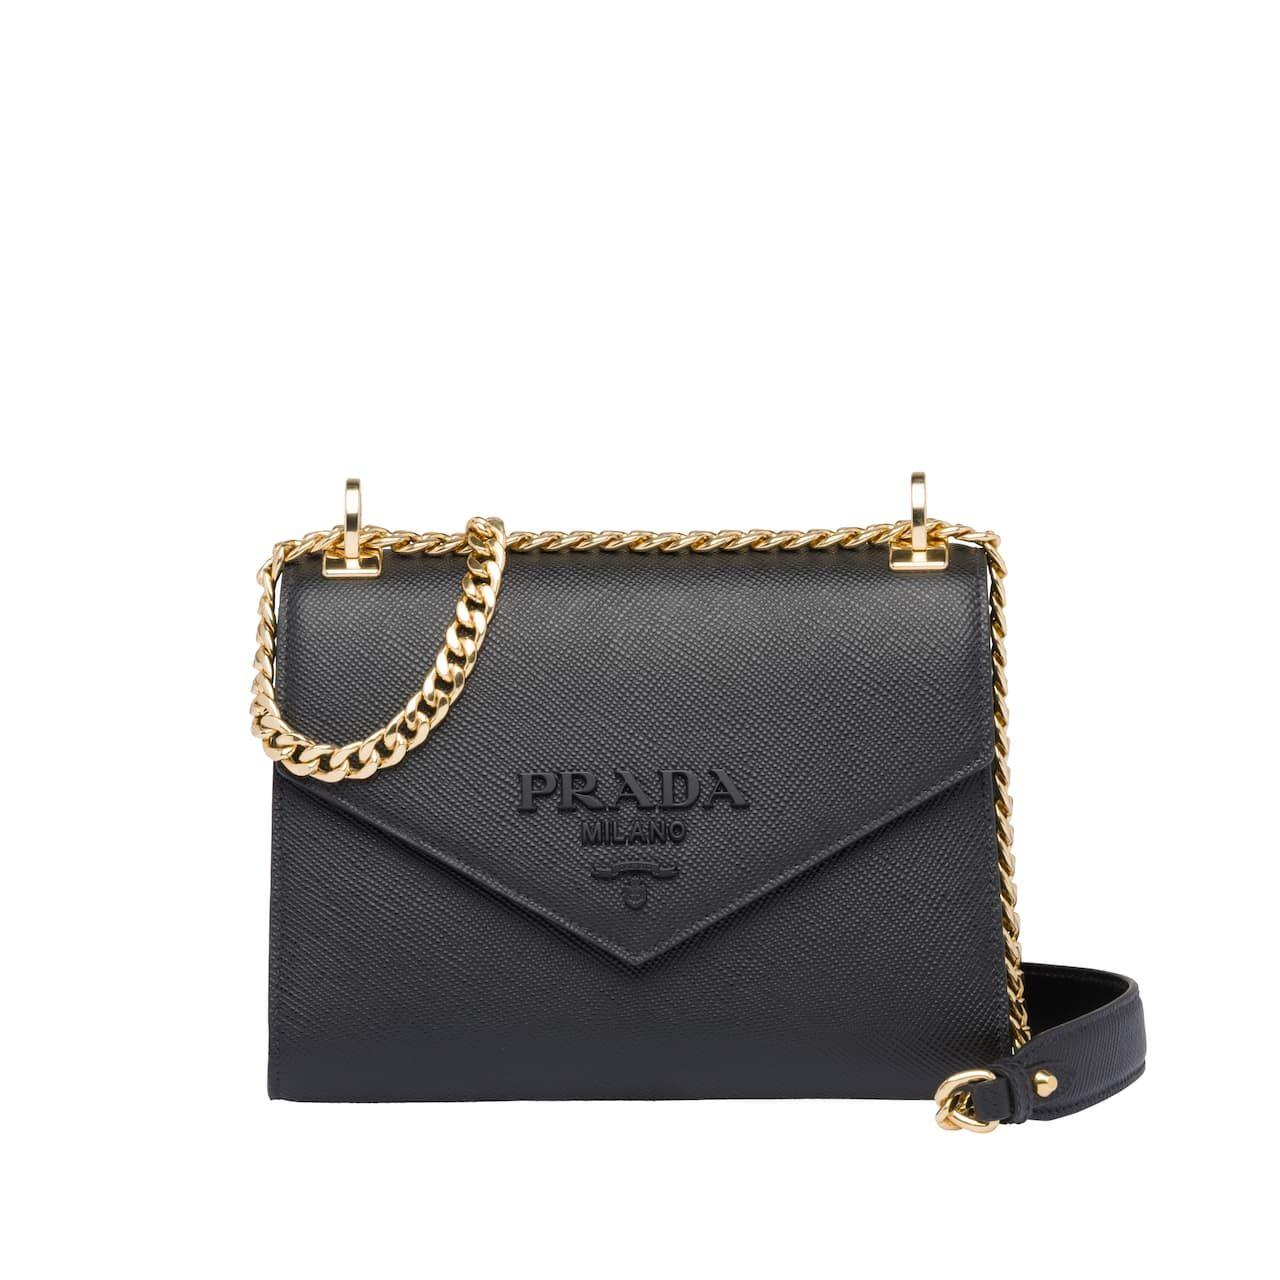 Photo of Prada Monochrome Saffiano leather bag